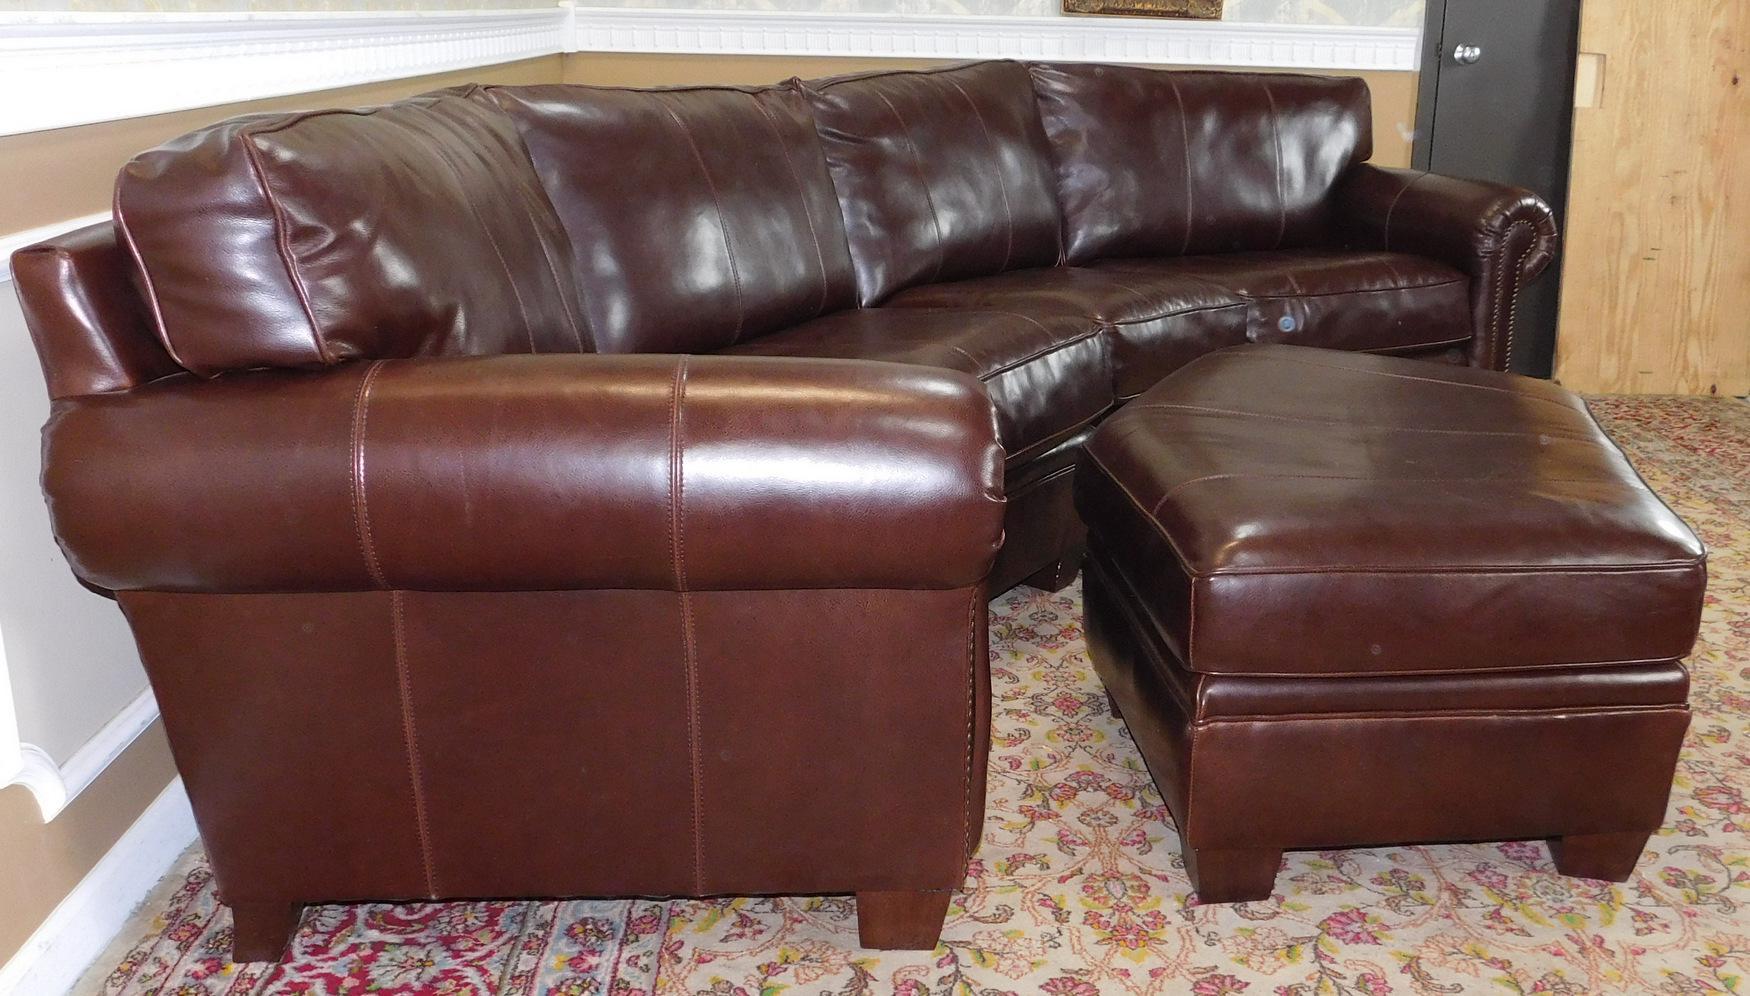 3 Piece Bernhardt Brown Leather Sectional Sofa U0026 Ottoman   Image 7 ...